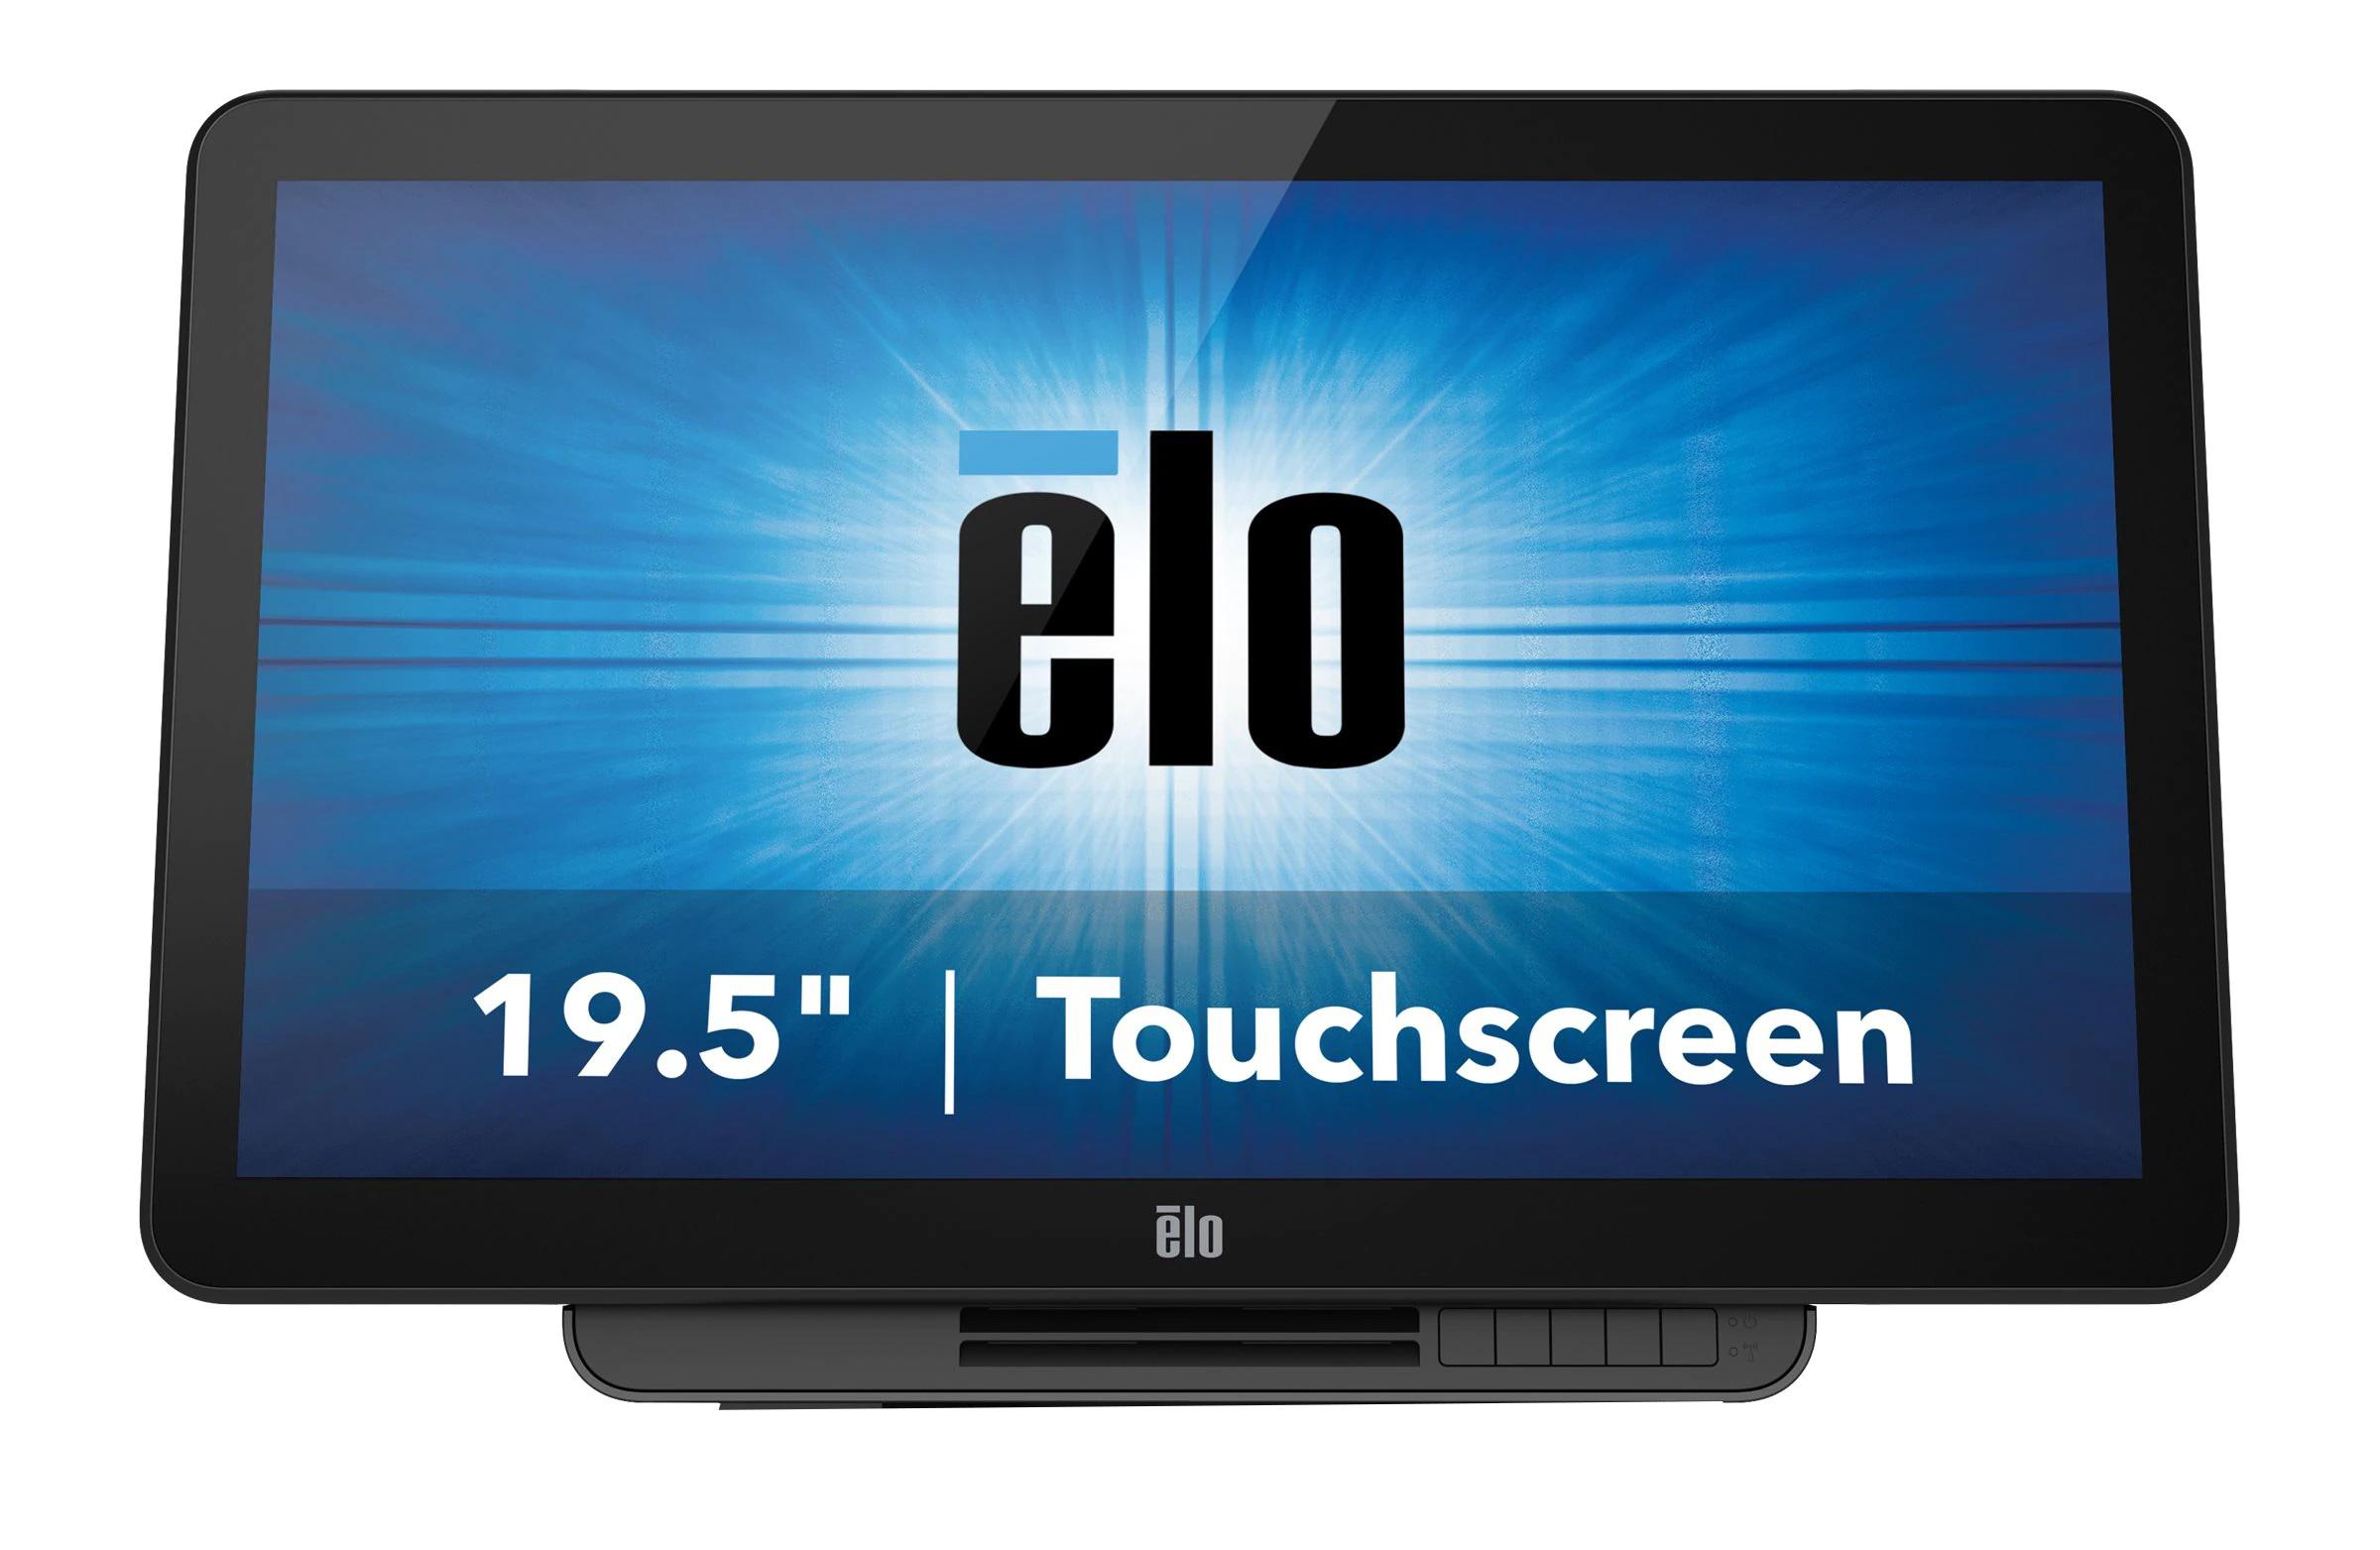 "Sistem POS ELO ESY20x5, Display 19.5"" Touchscreen 1920  by 1080 , Intel Core i5 4590T 2.0 GHz, 8 GB DDR3, 128 GB SSD SATA, WI-FI,Bluetooth, Lipsa Picior, Windows 10 Pro, 2 Ani Garantie - imaginea 1"